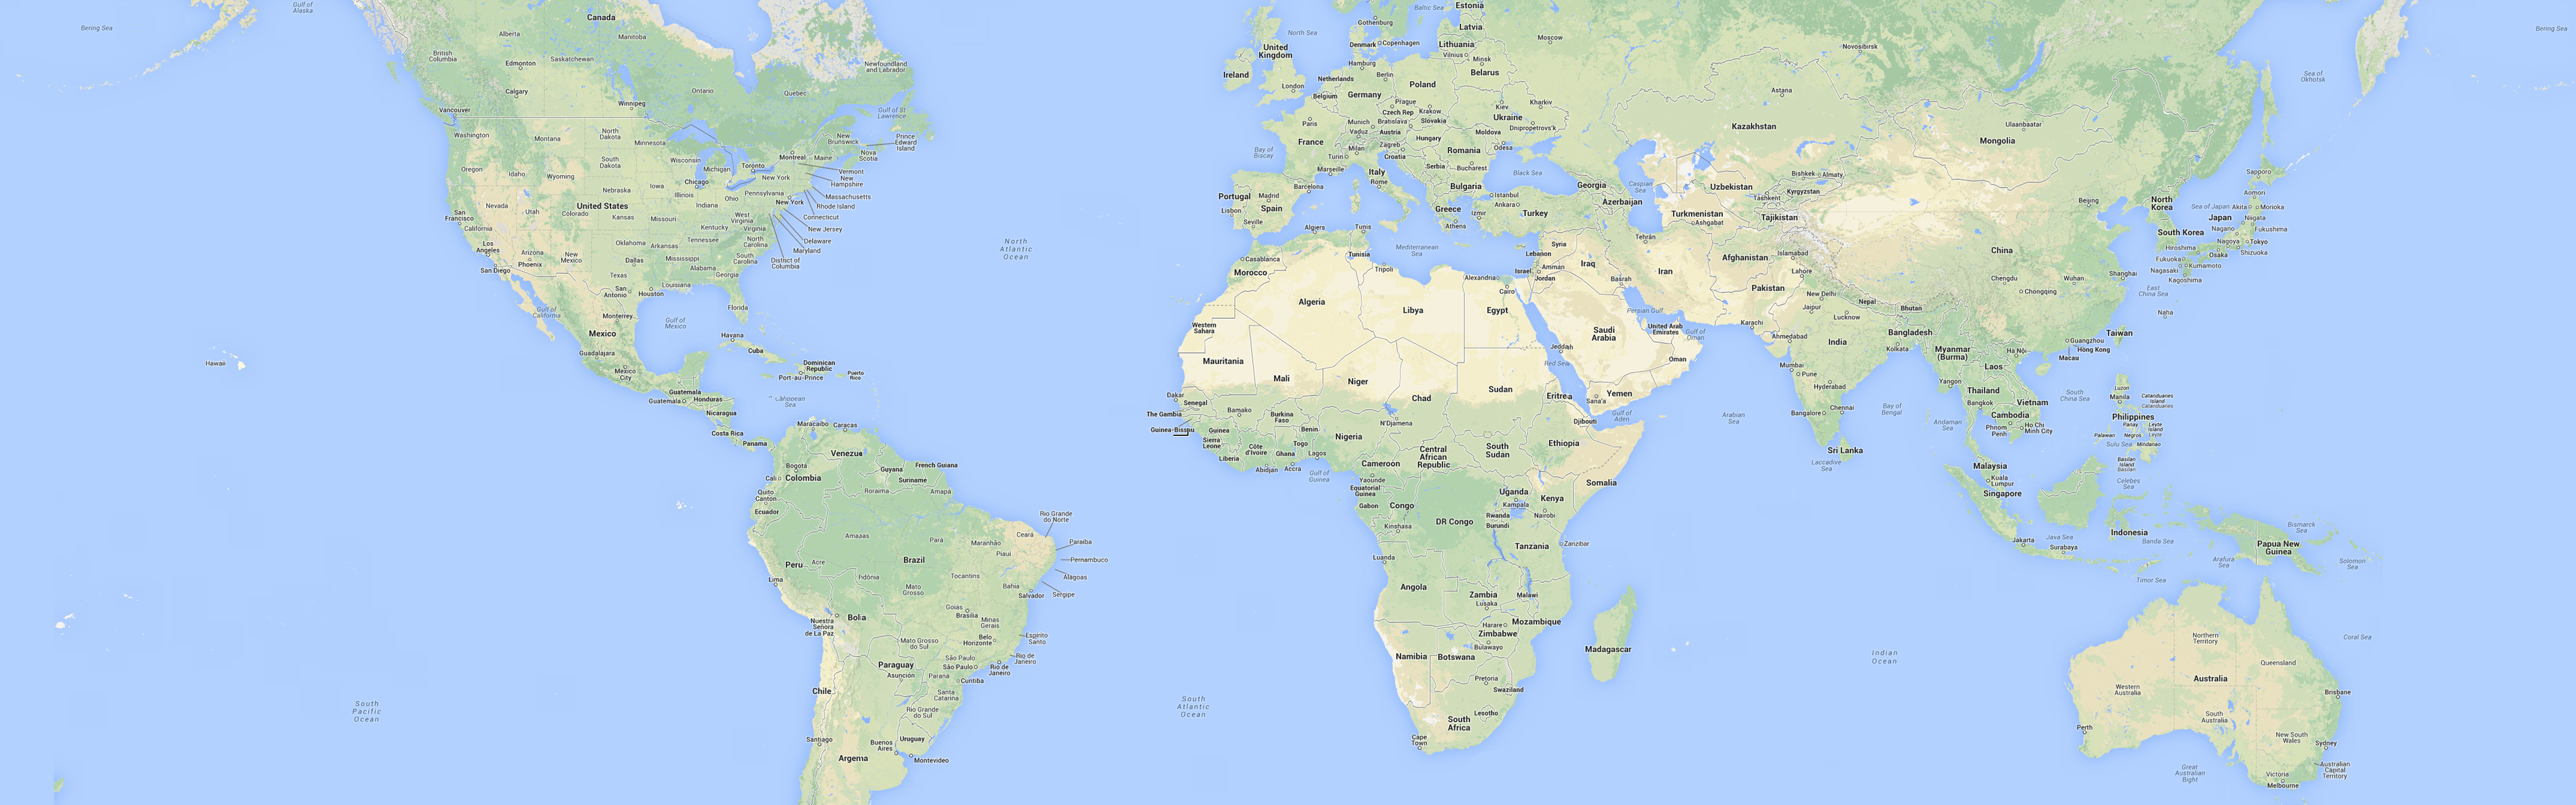 15 world map wallpaper - photo #33